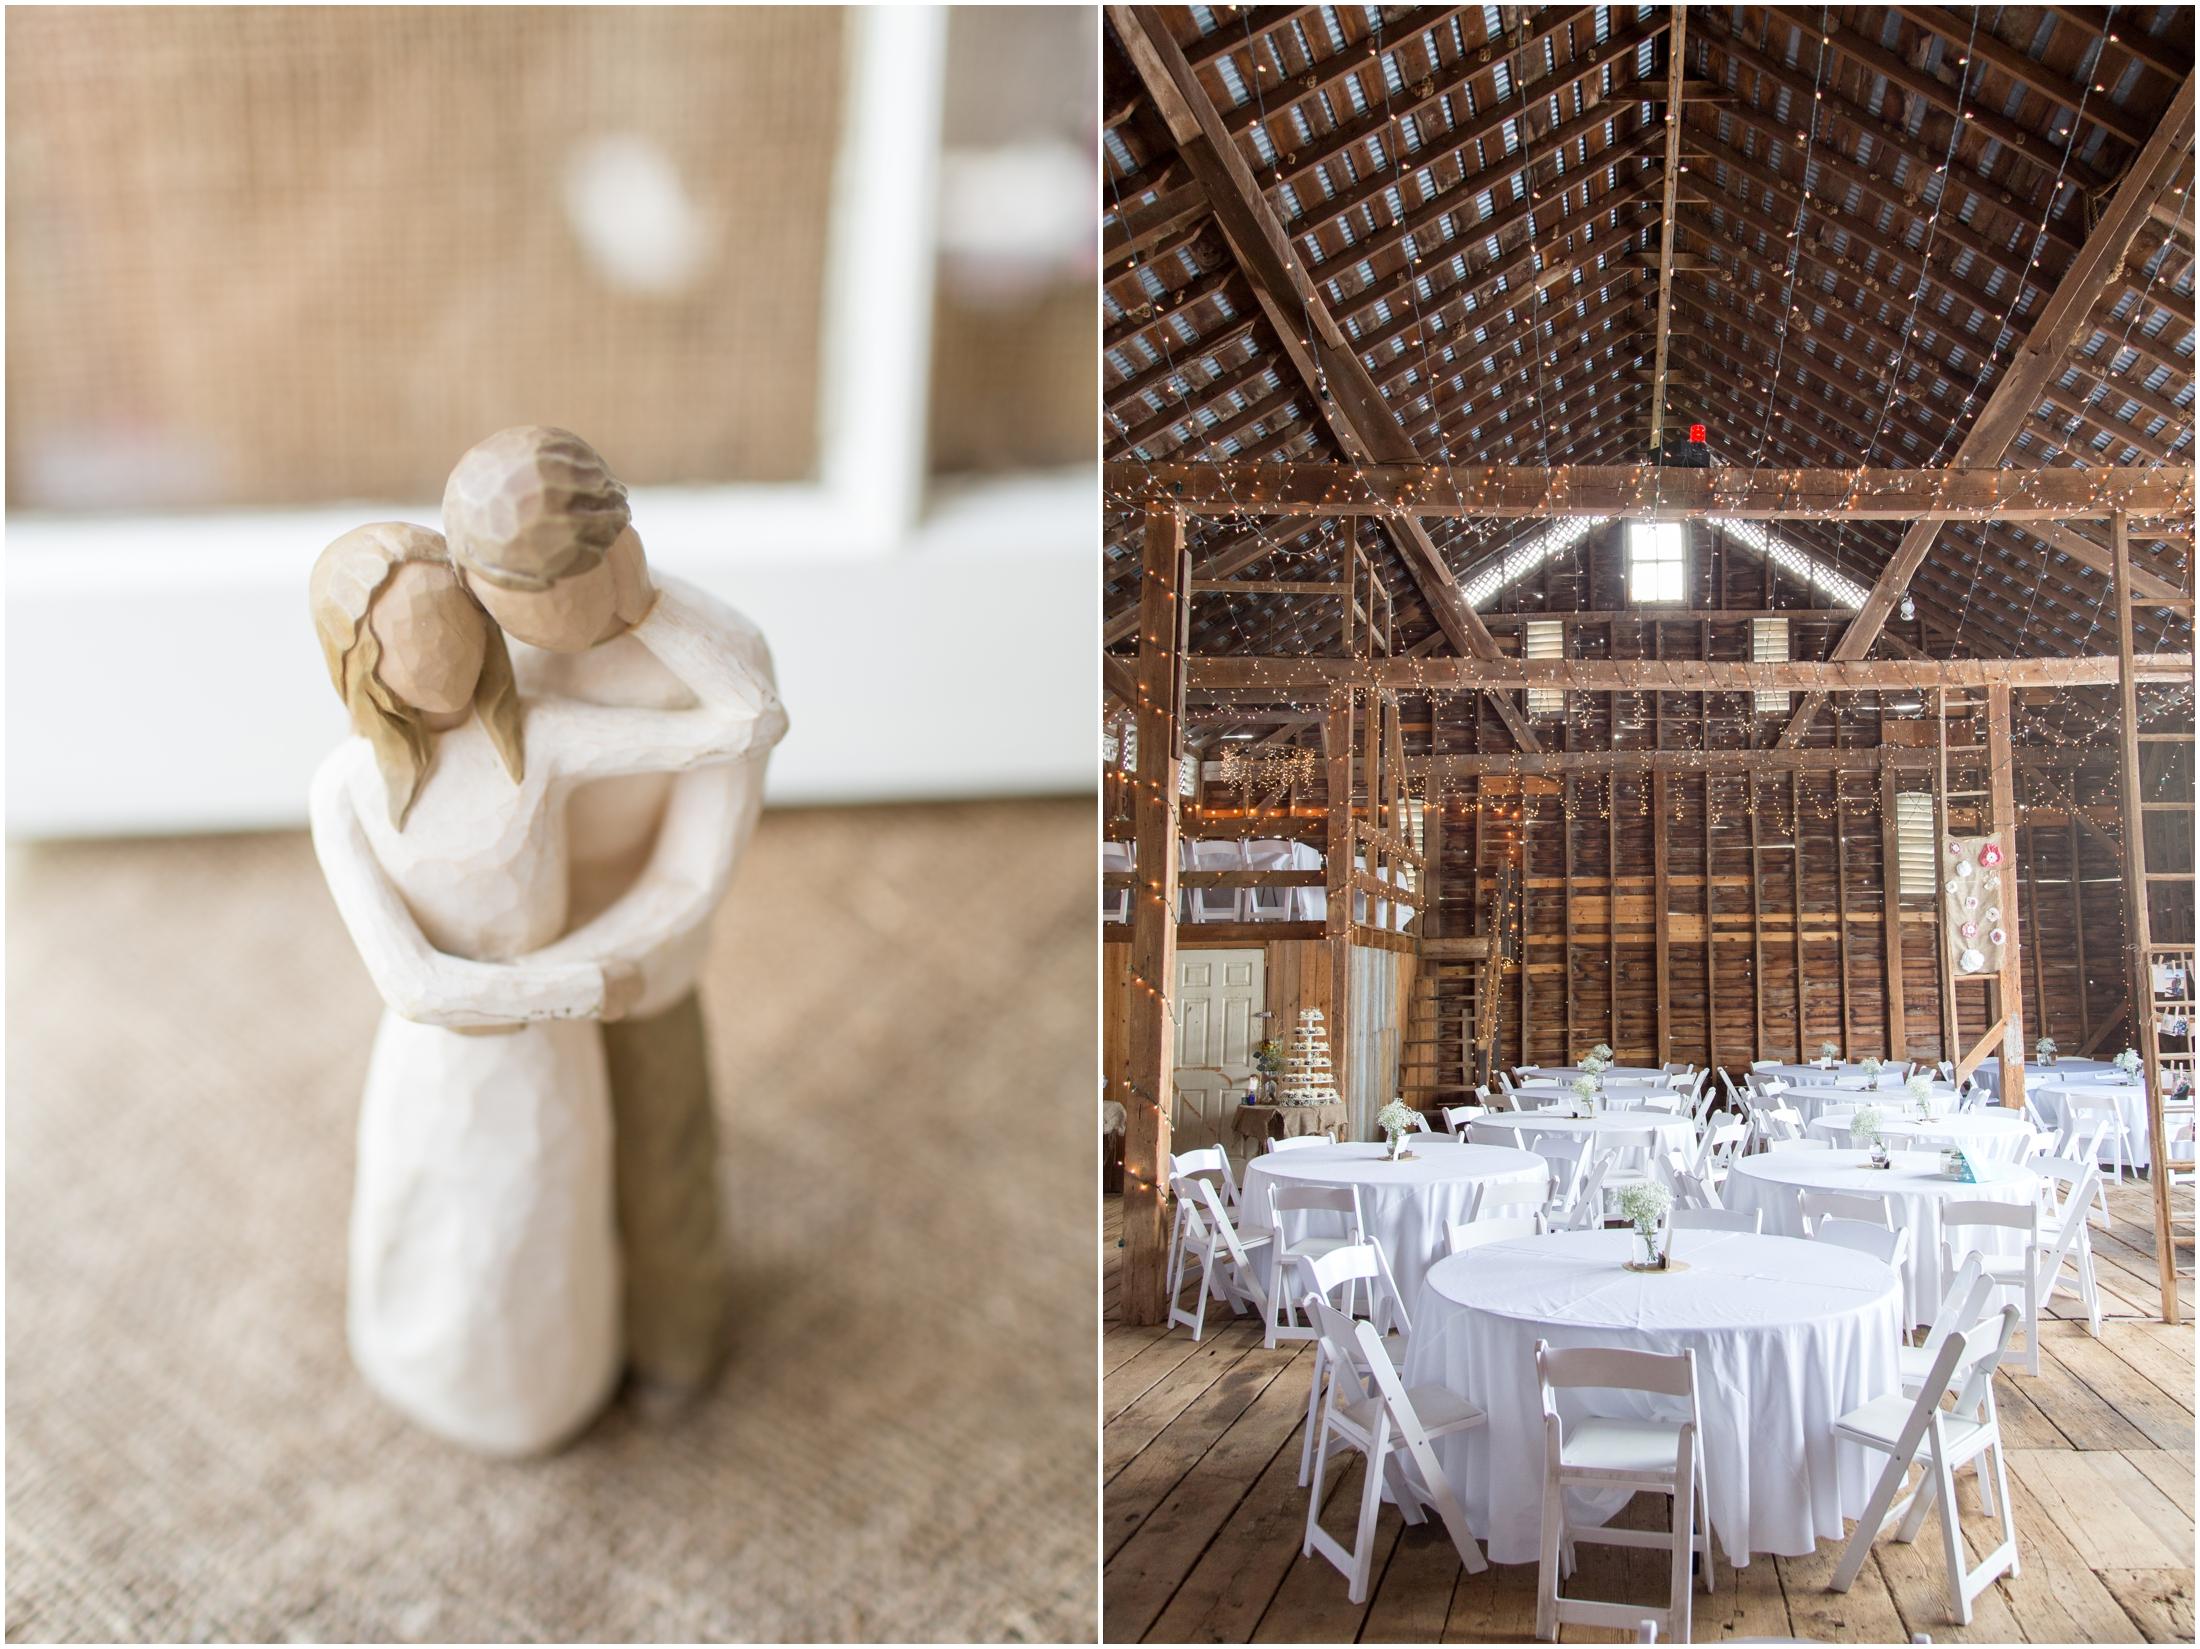 Nash-Wedding-Reception-1050.jpg